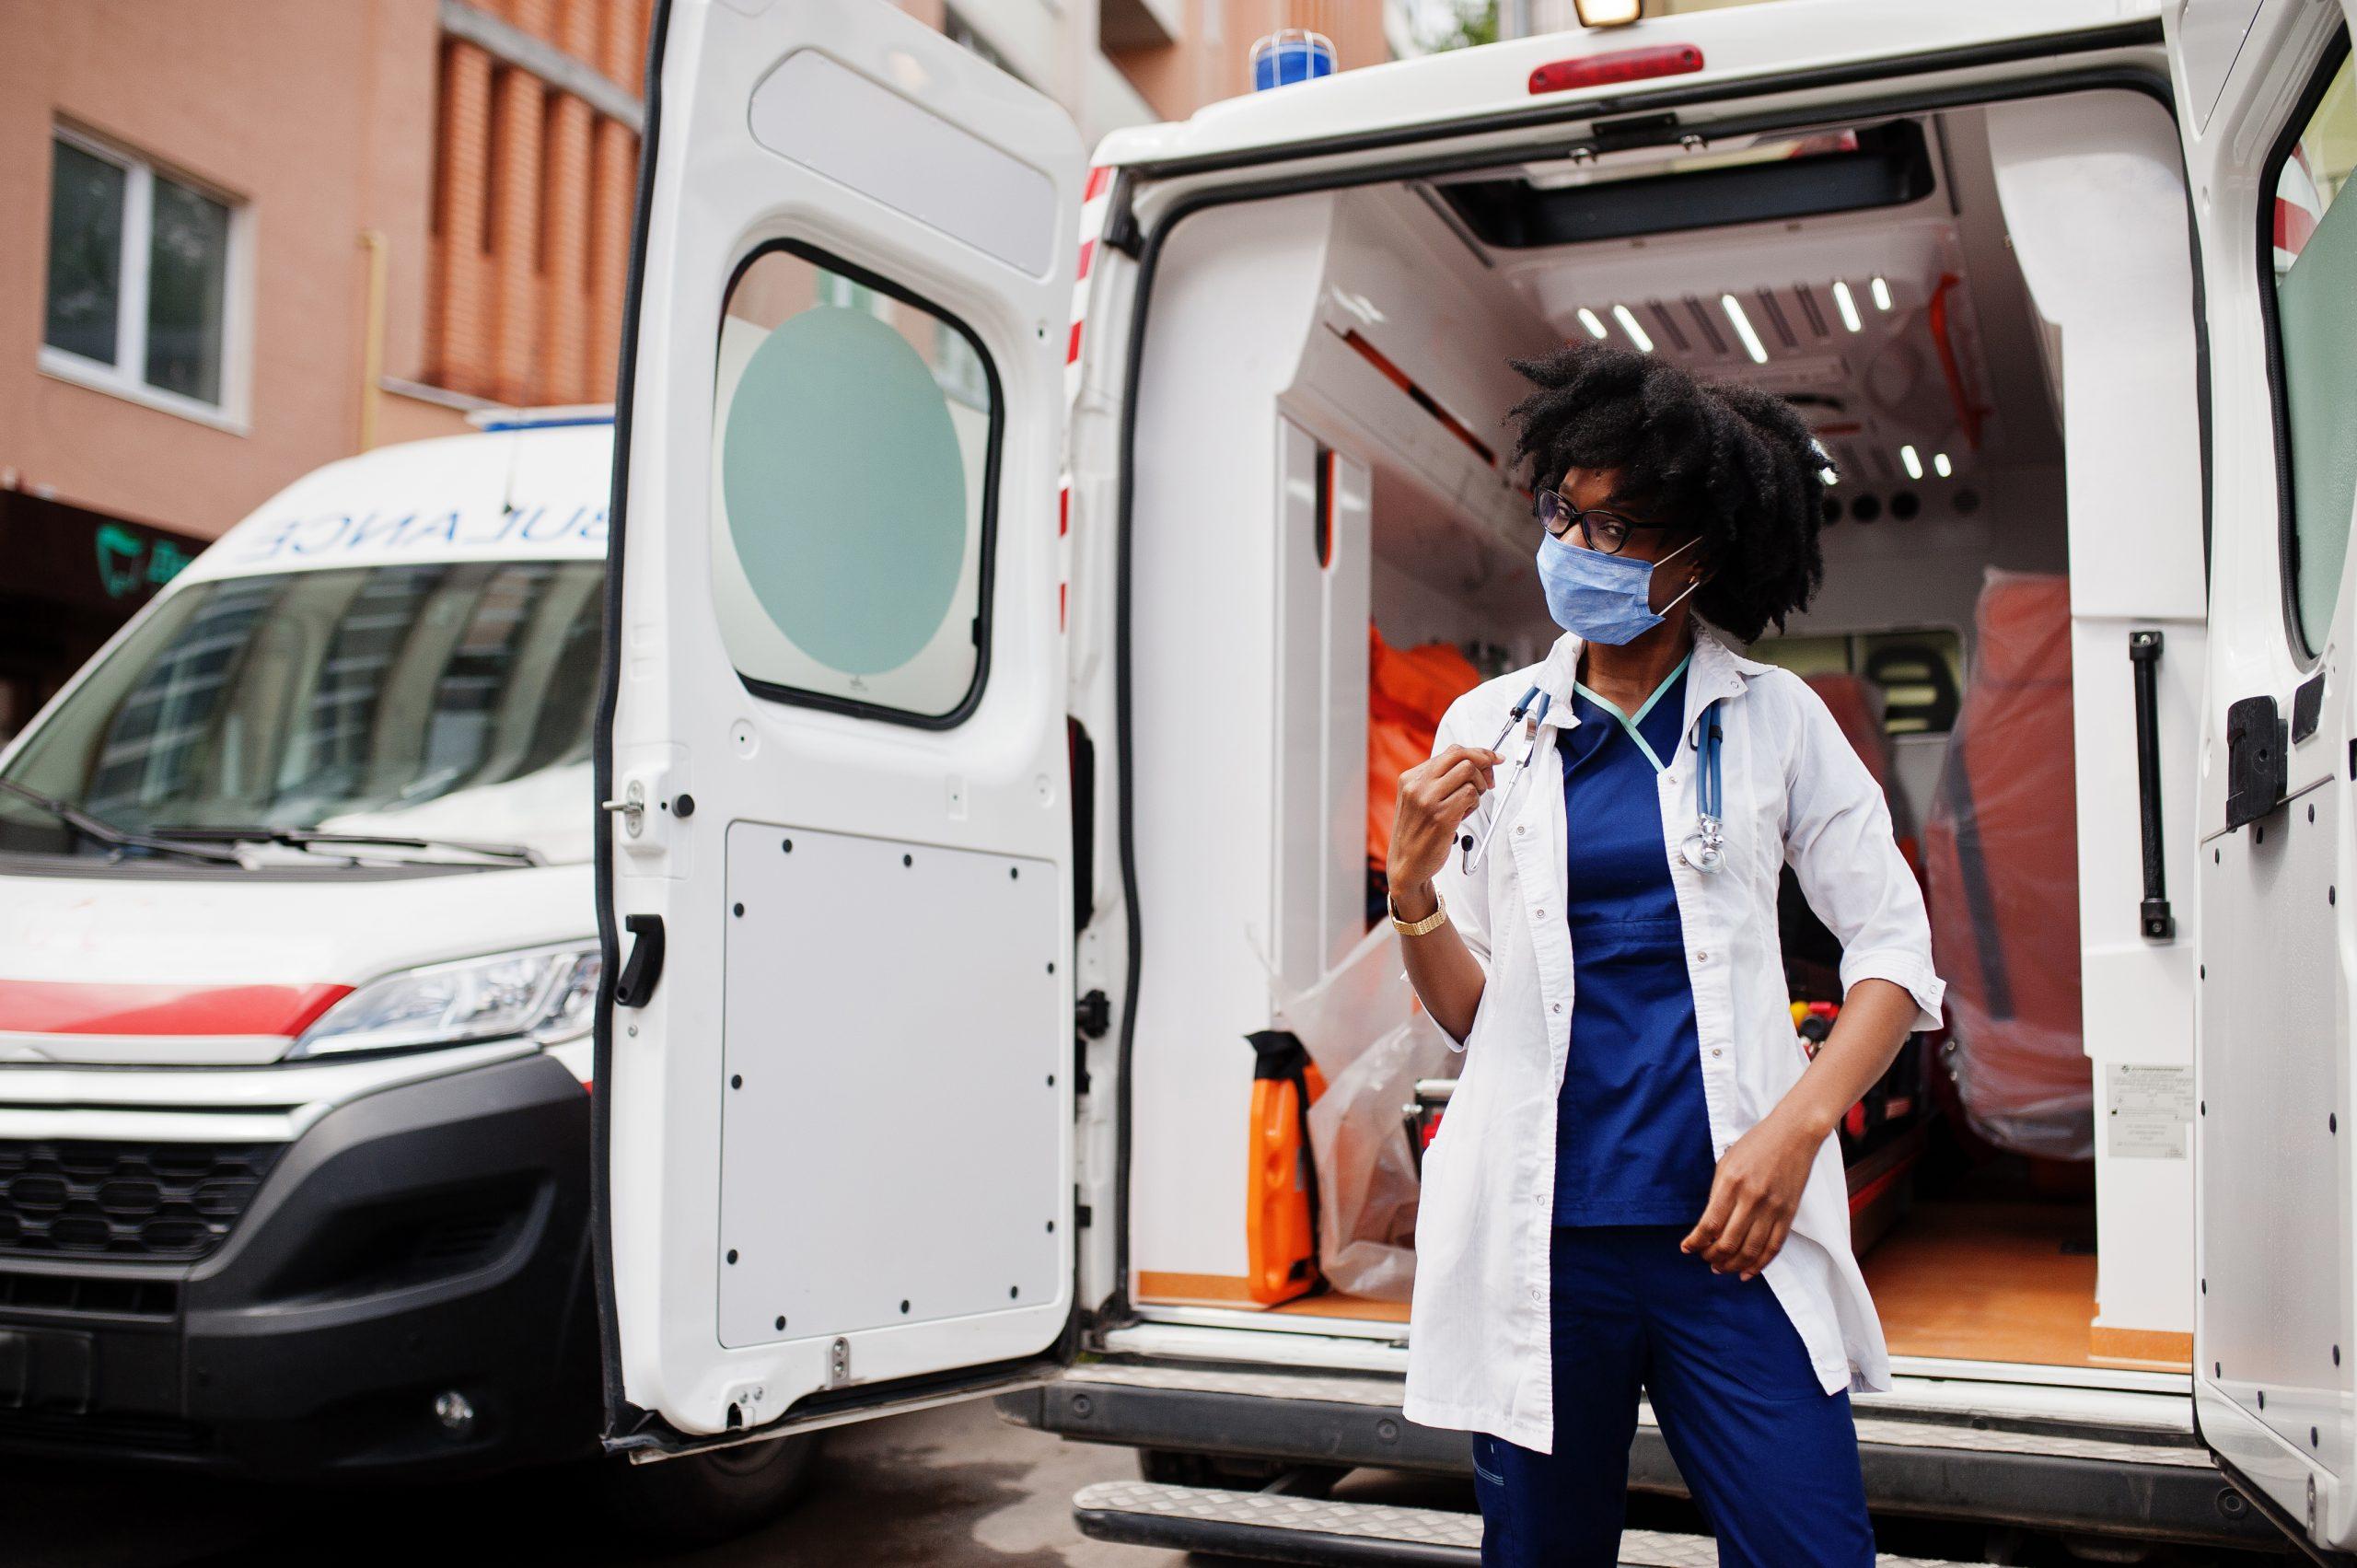 Ambulance Driver With mask on